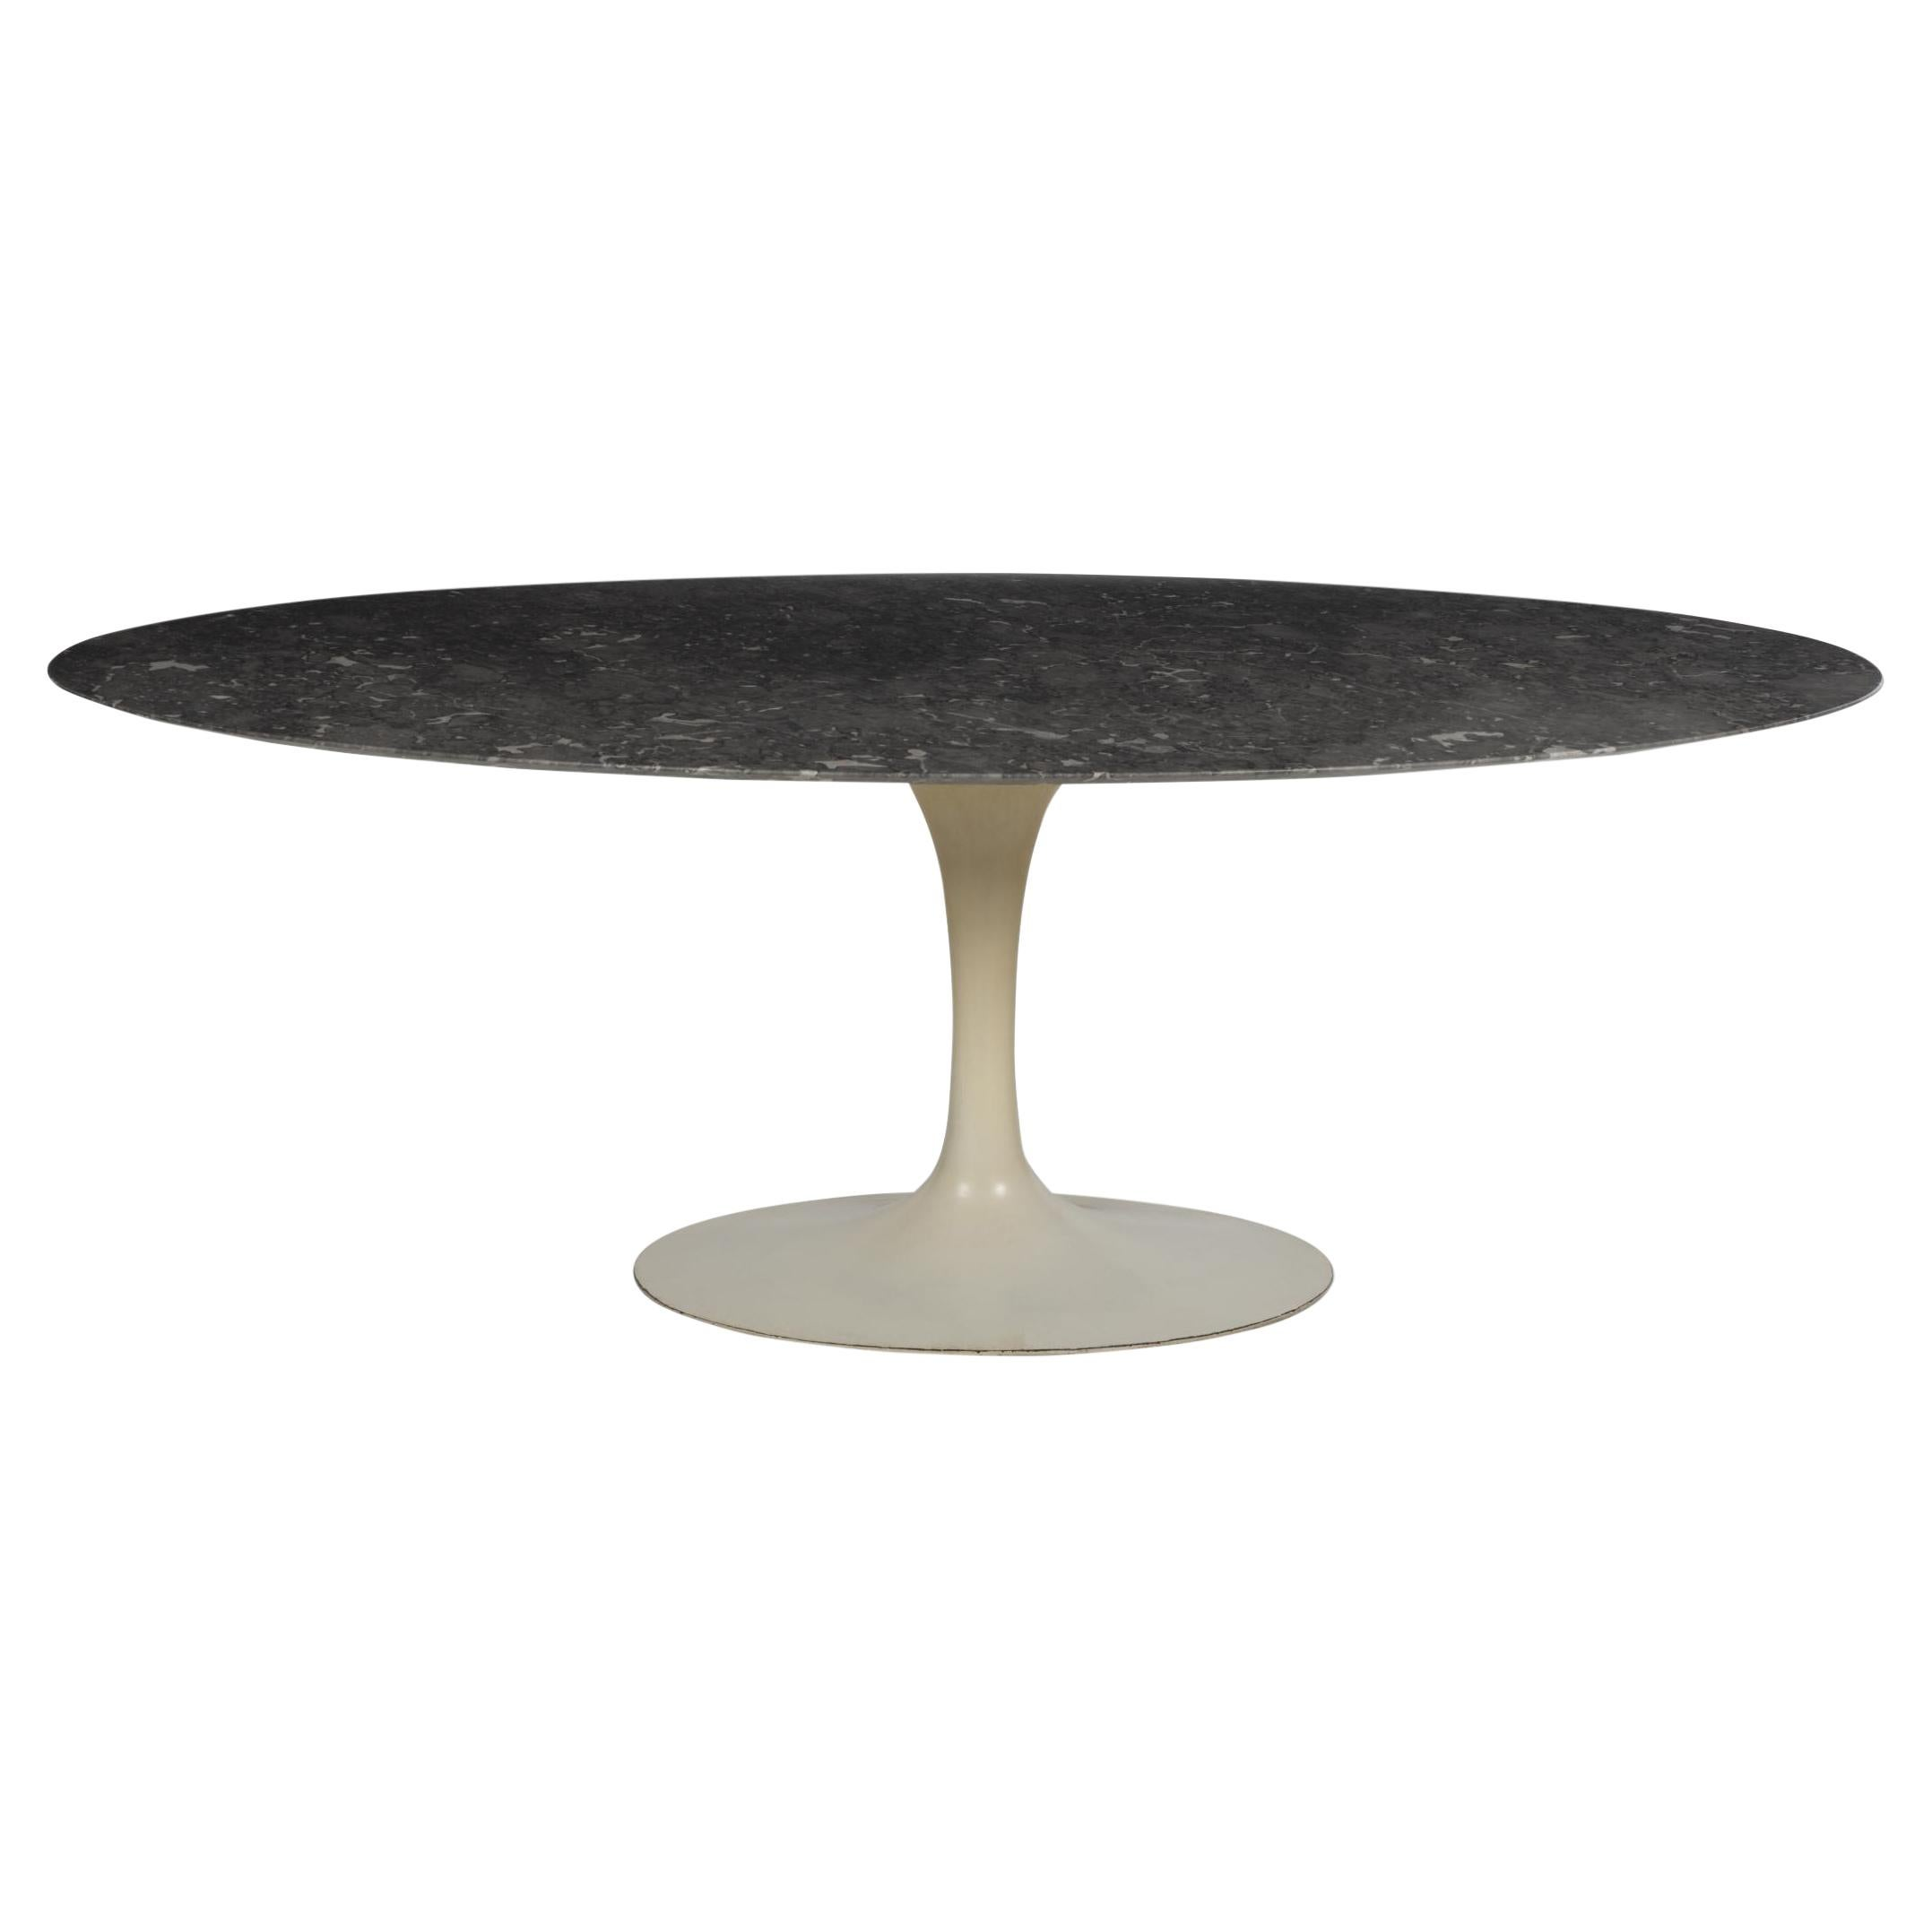 Early Eero Saarinen for Knoll Tulip Table Cast Iron Base, Marble Top